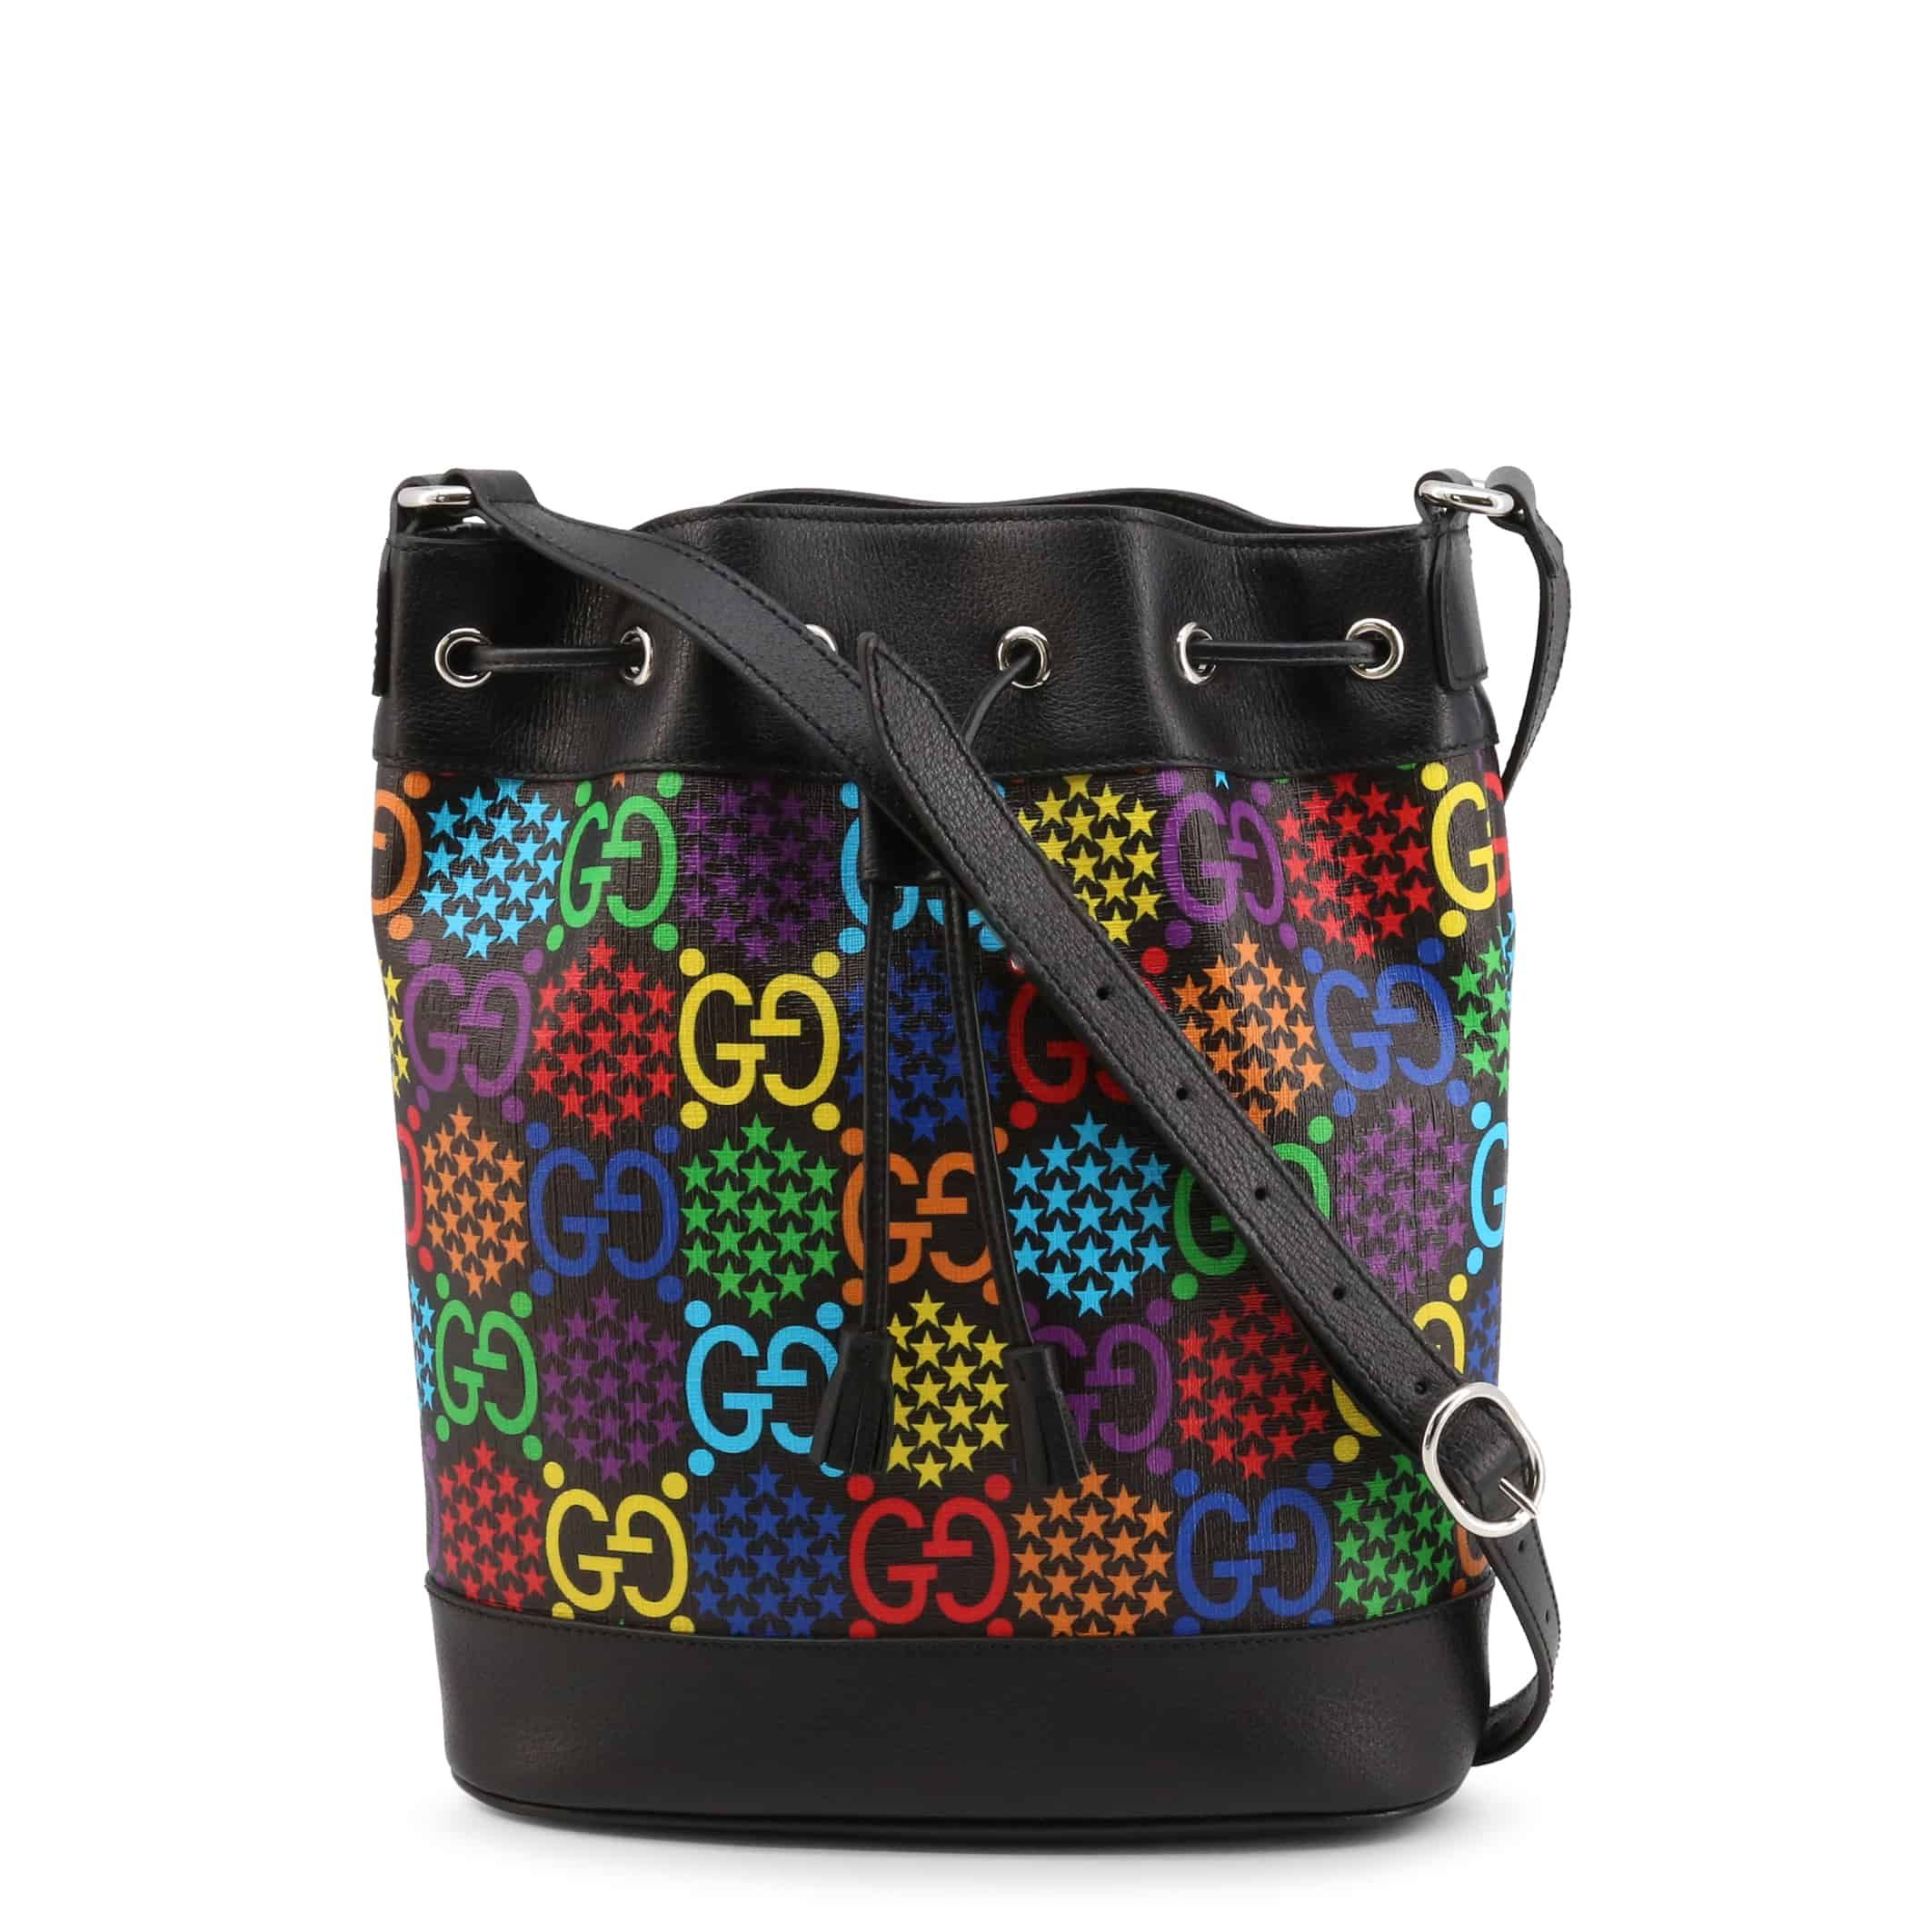 Gucci – 598149_HPUBN – Zwart Designeritems.nl